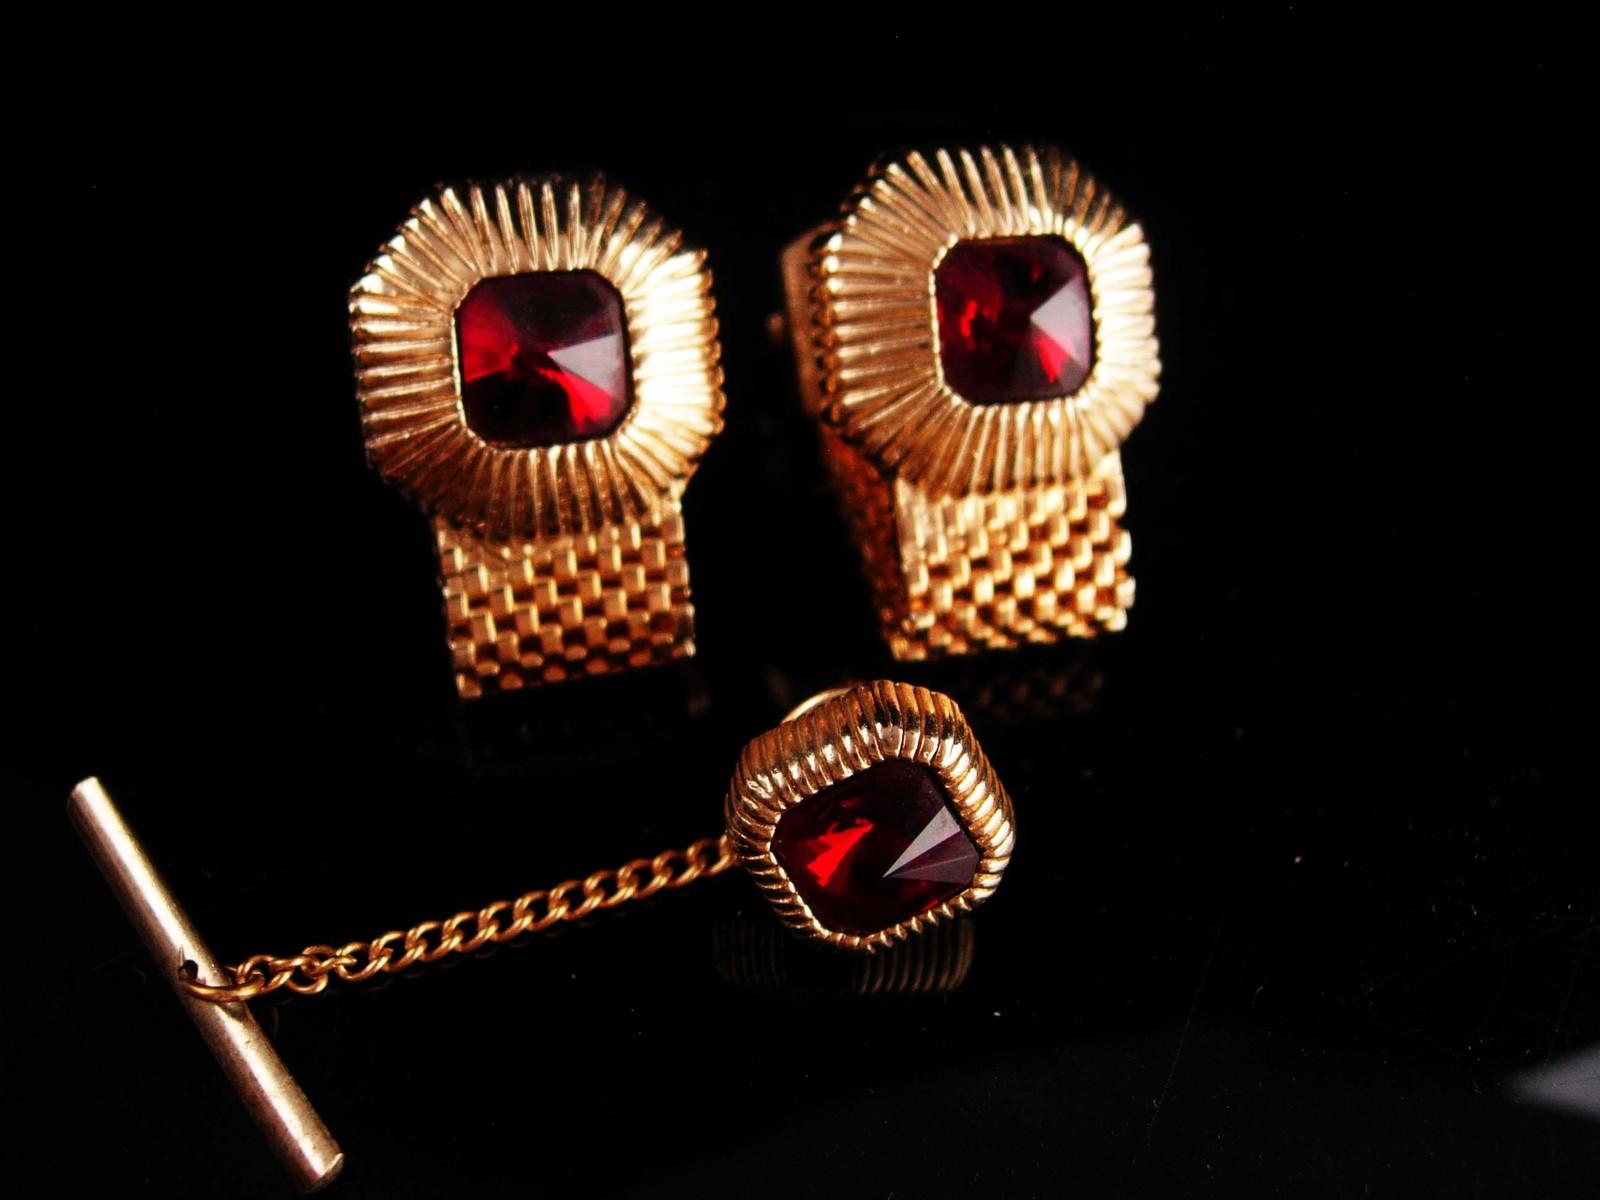 Garnet Wrap Mesh Cufflinks - Red  Rhinestone Jeweled tie tack - Birthday Wedding